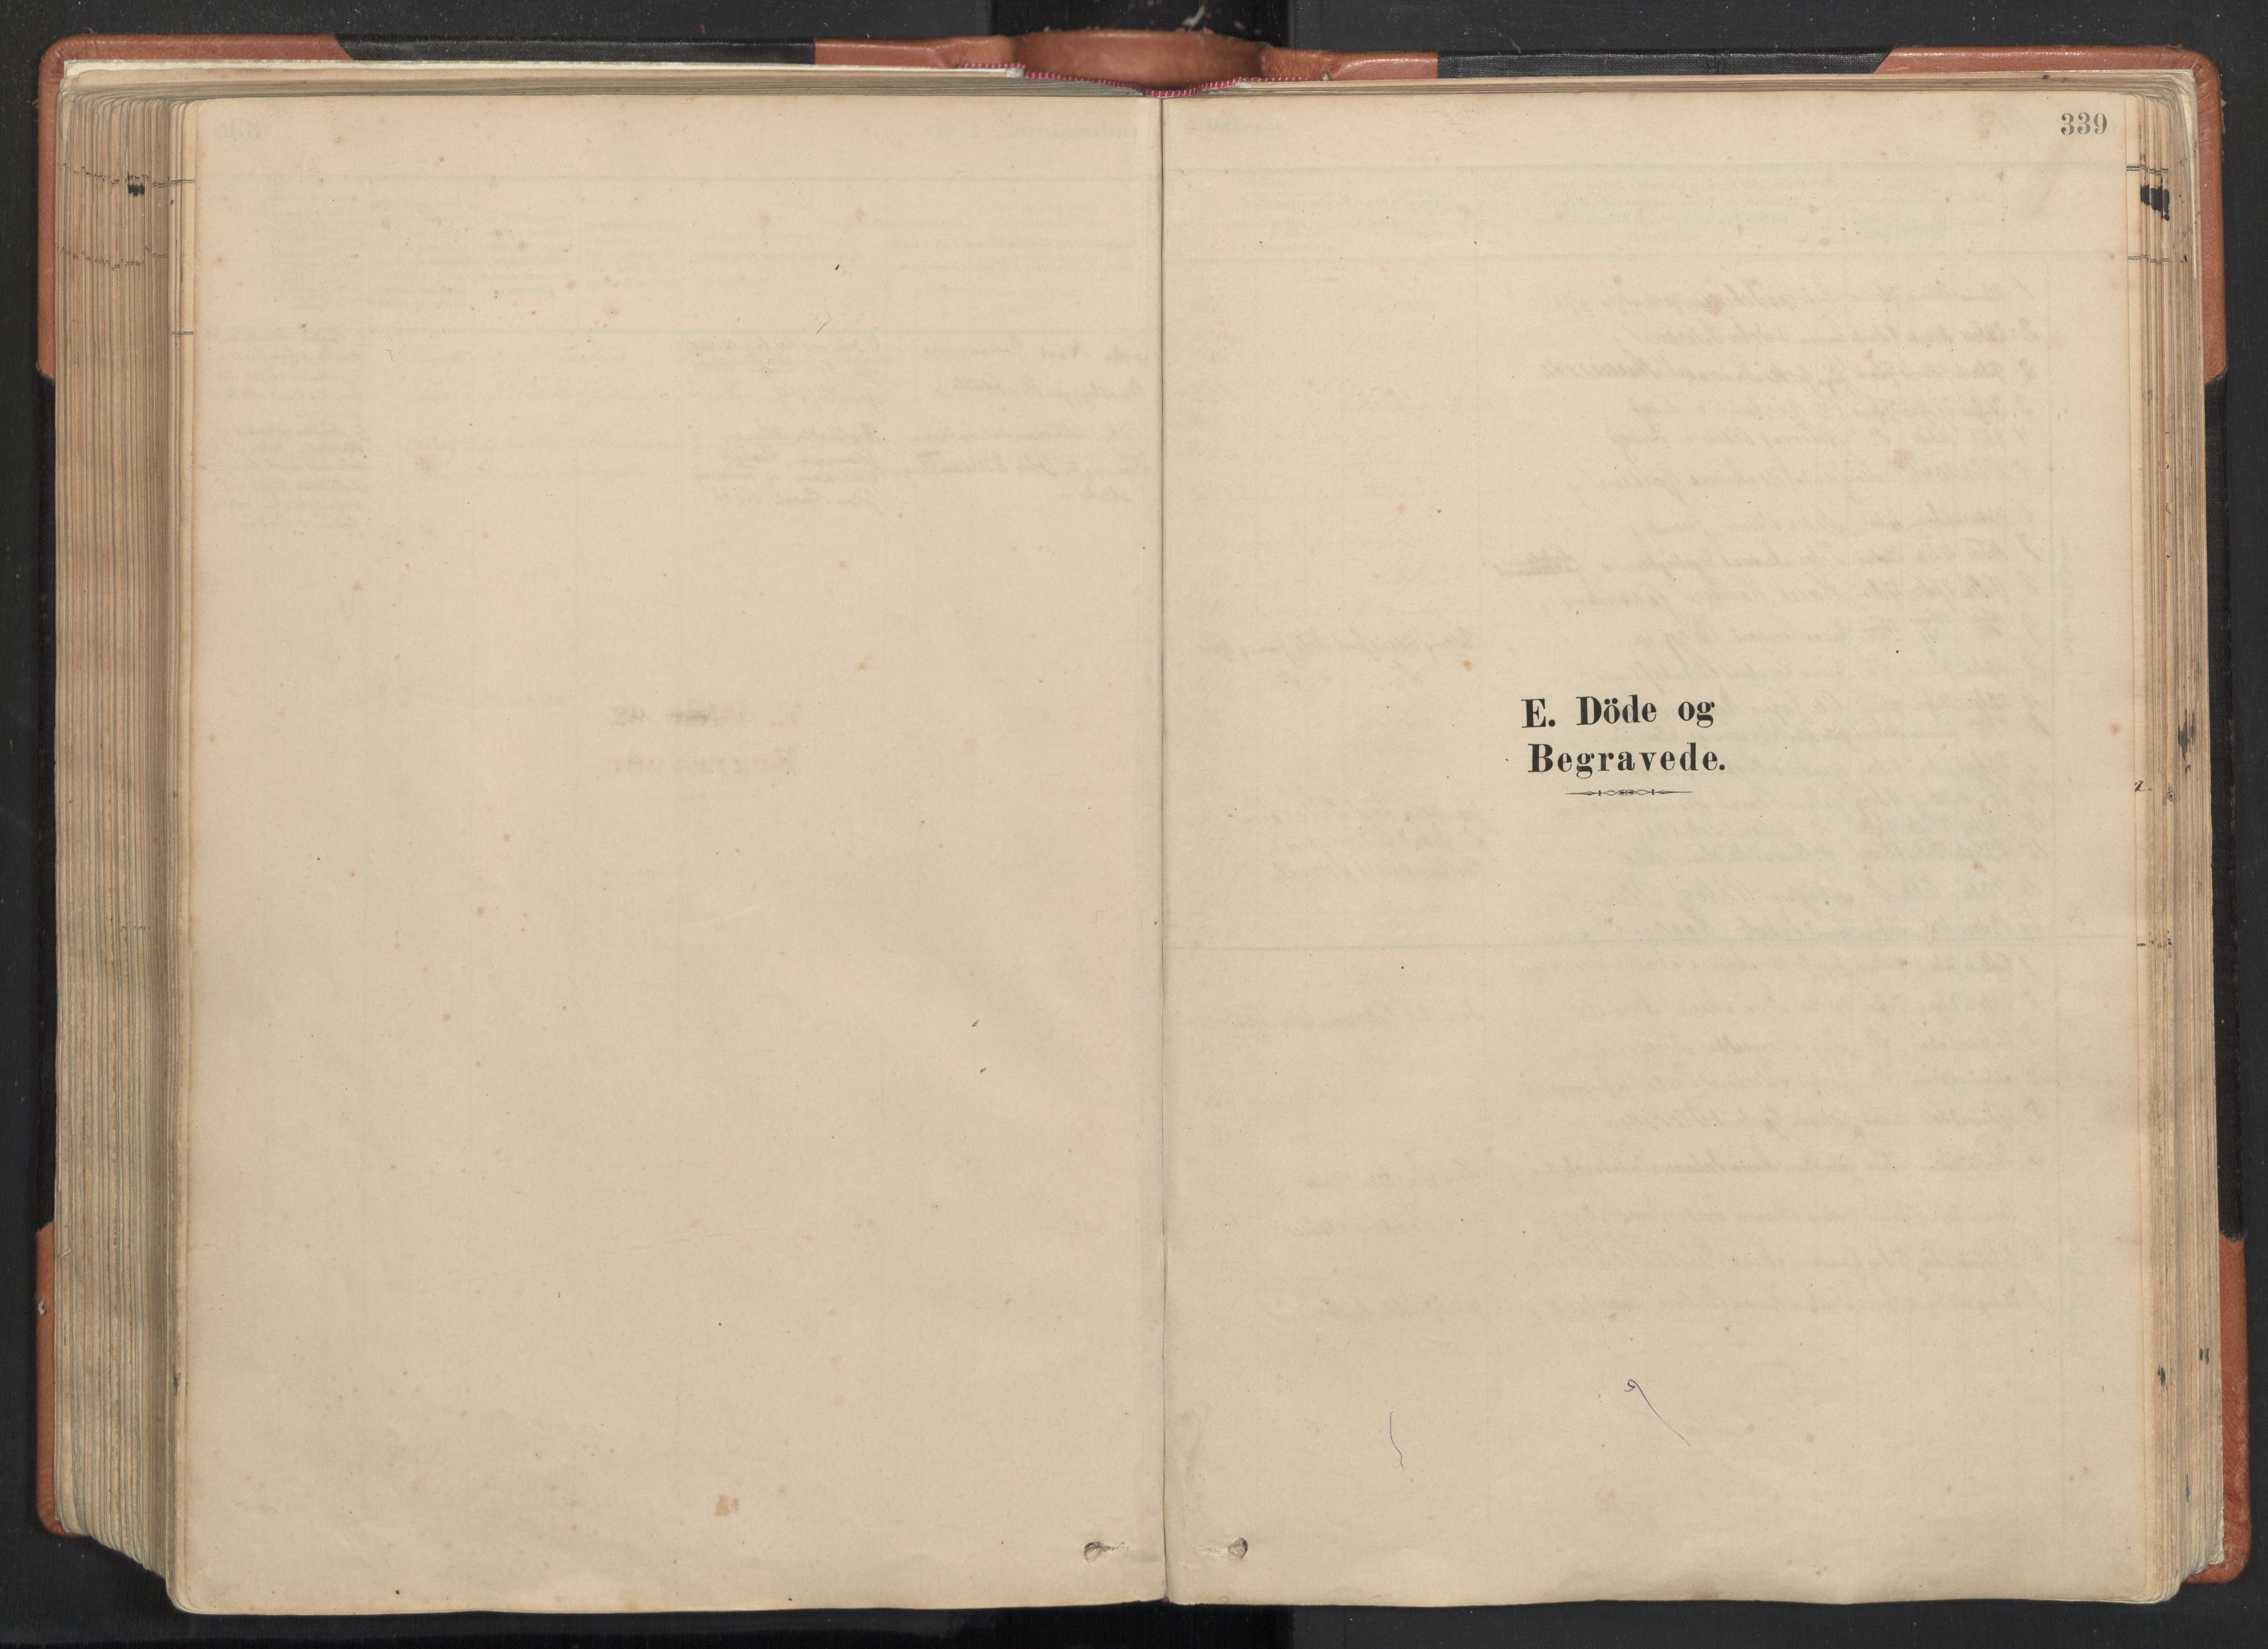 SAT, Ministerialprotokoller, klokkerbøker og fødselsregistre - Nordland, 817/L0264: Ministerialbok nr. 817A04, 1878-1907, s. 339